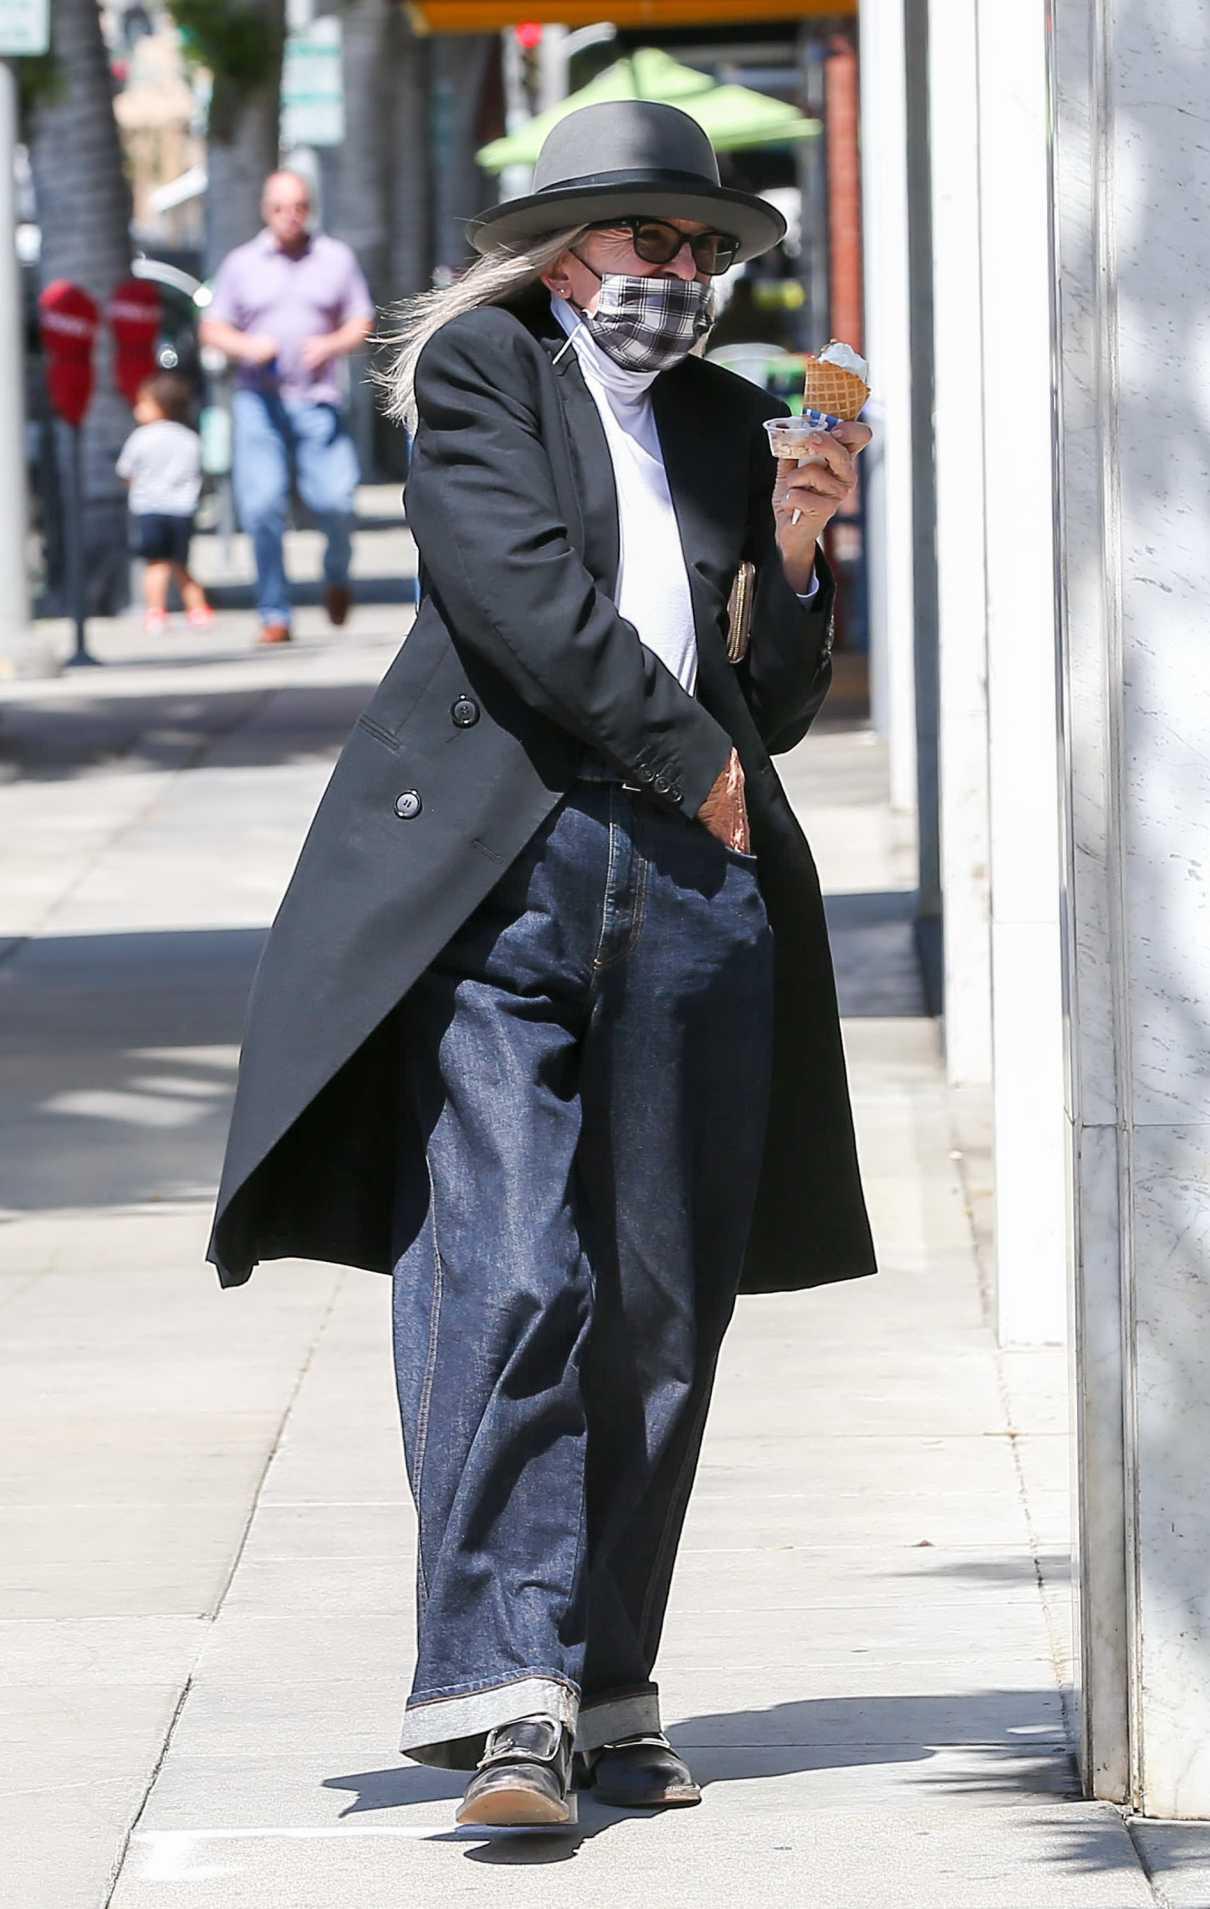 Diane Keaton in a Black Trench Coat